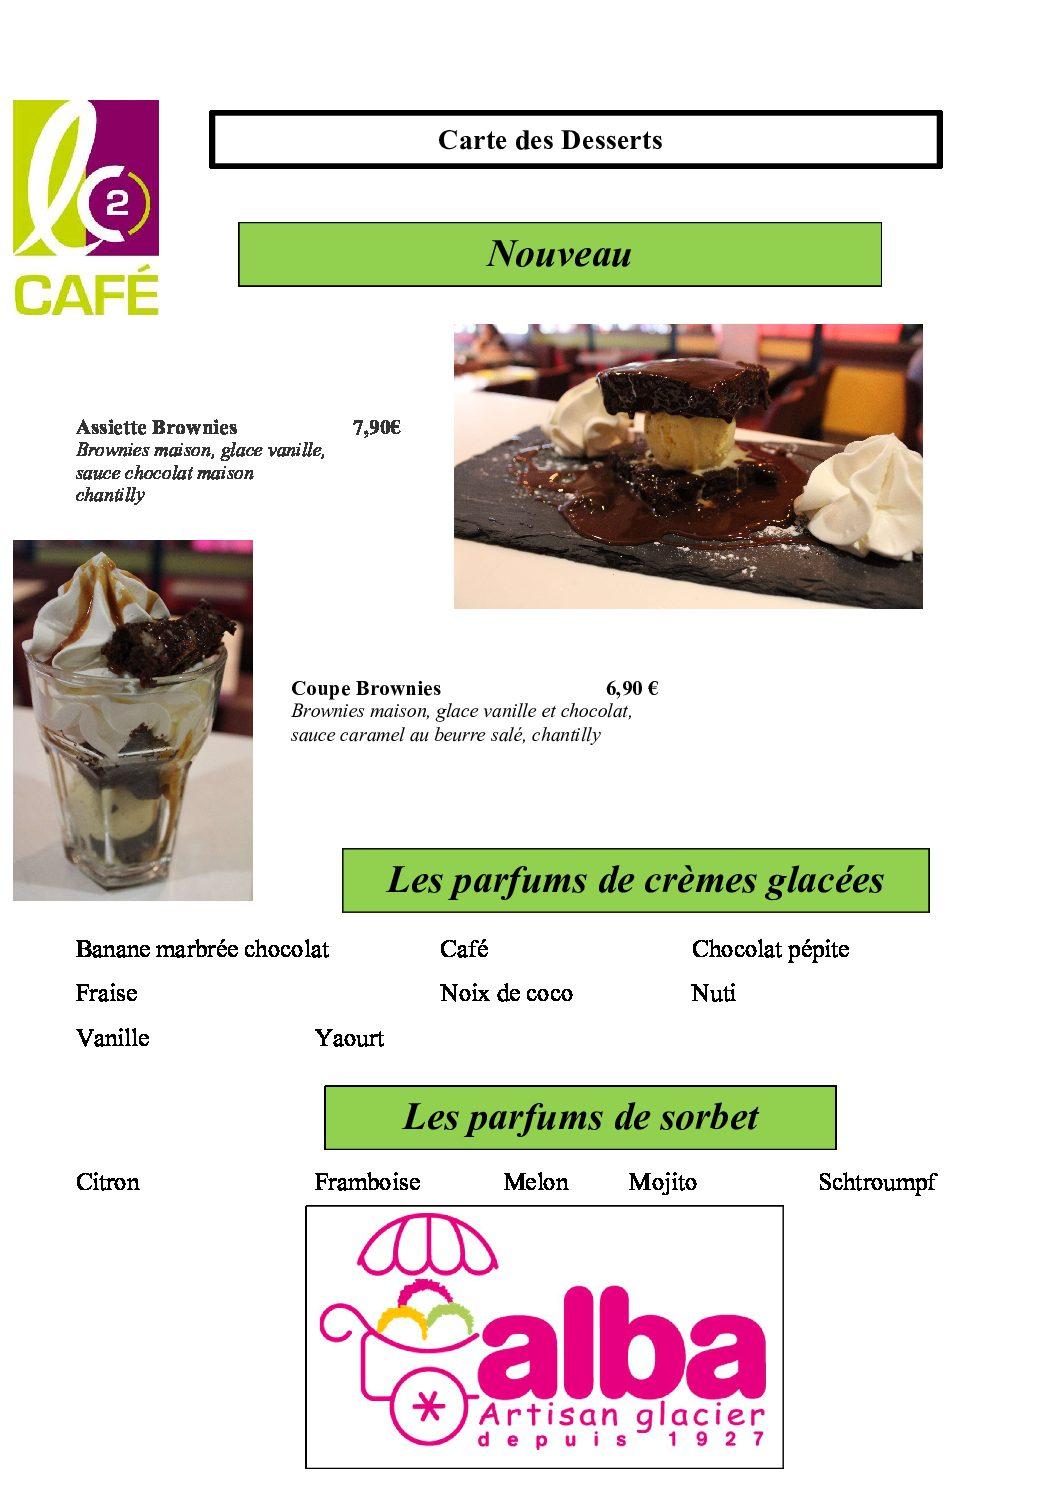 10 - carte des desserts